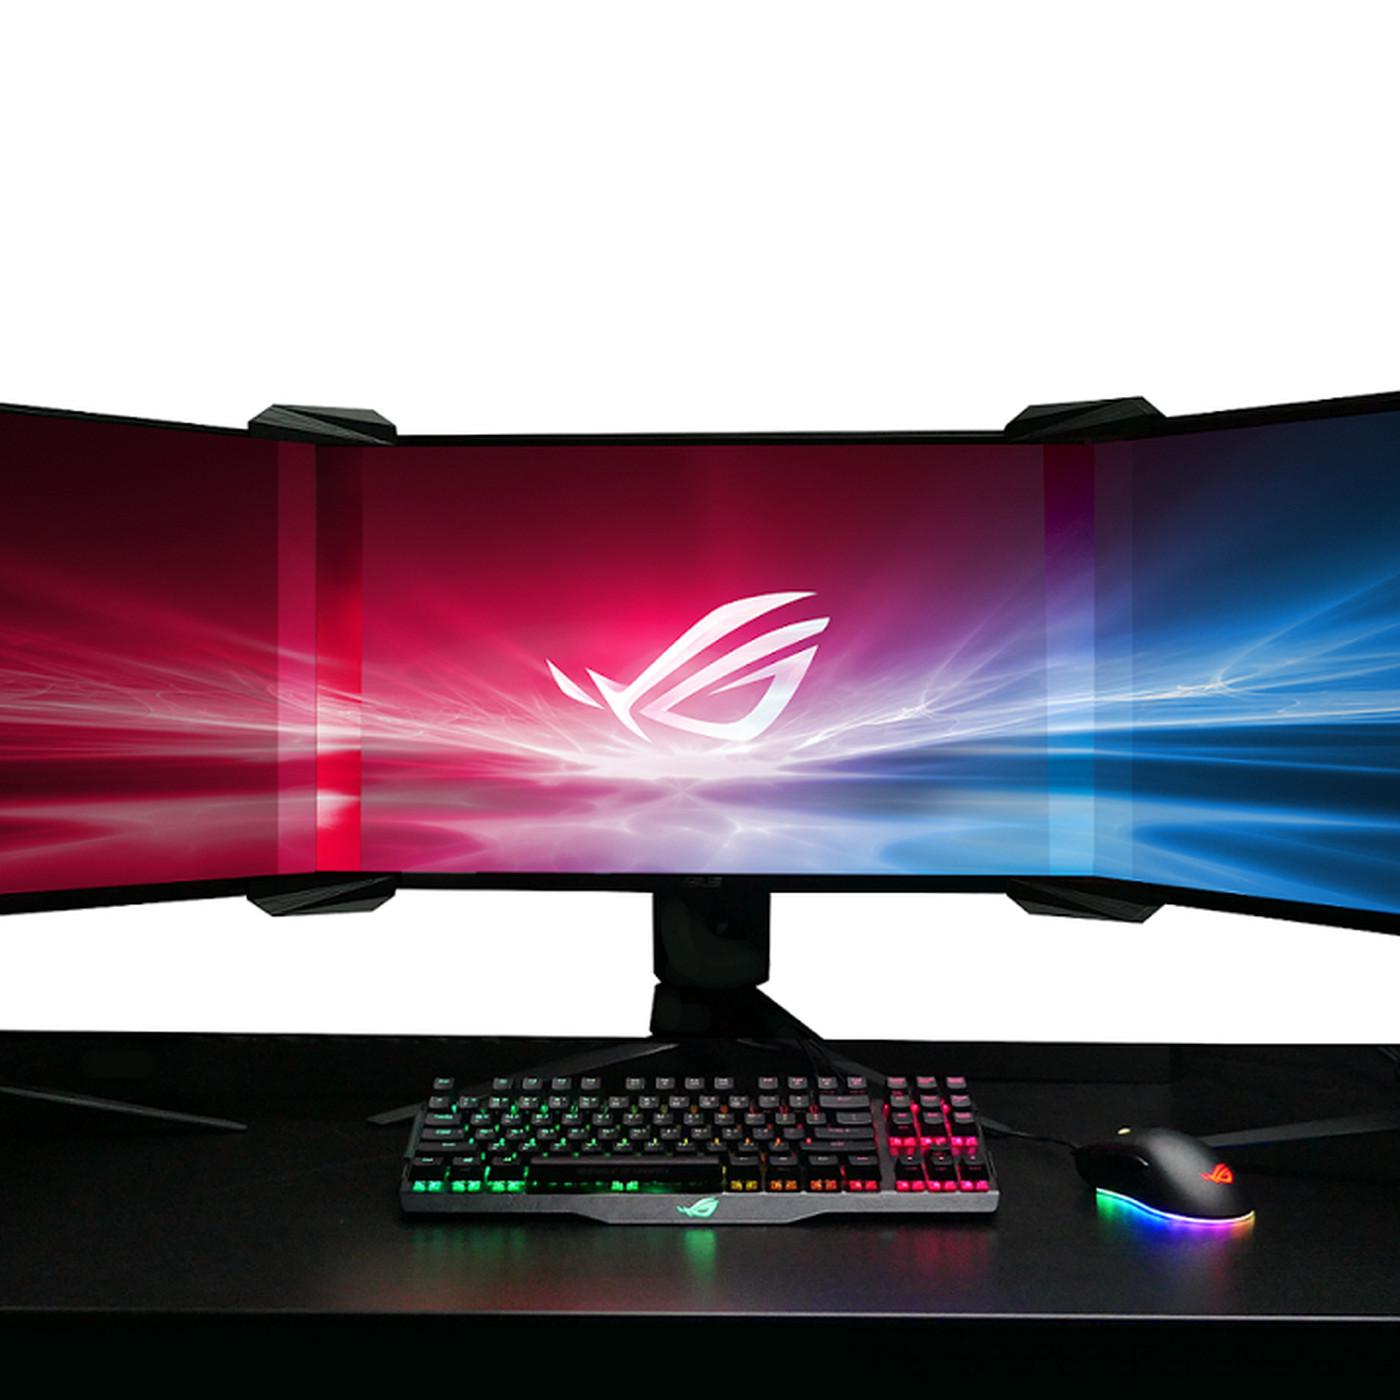 Asus ROG's new Bezel-free Kit uses light refraction to make monitor